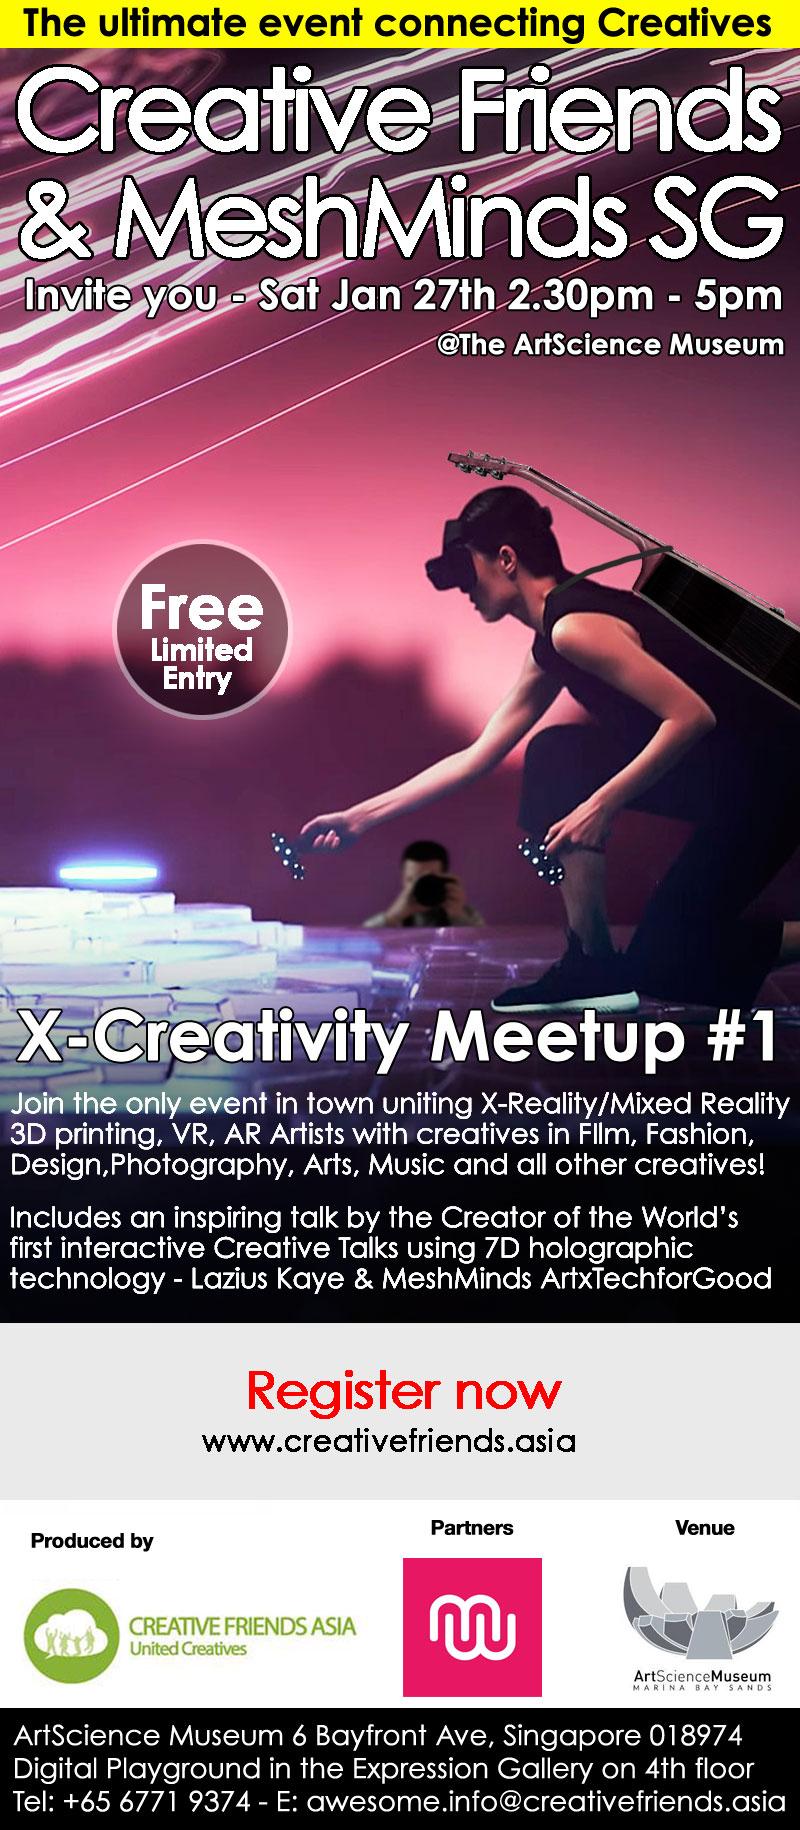 X-Creativity Creative Friend MeshMinds event flyer